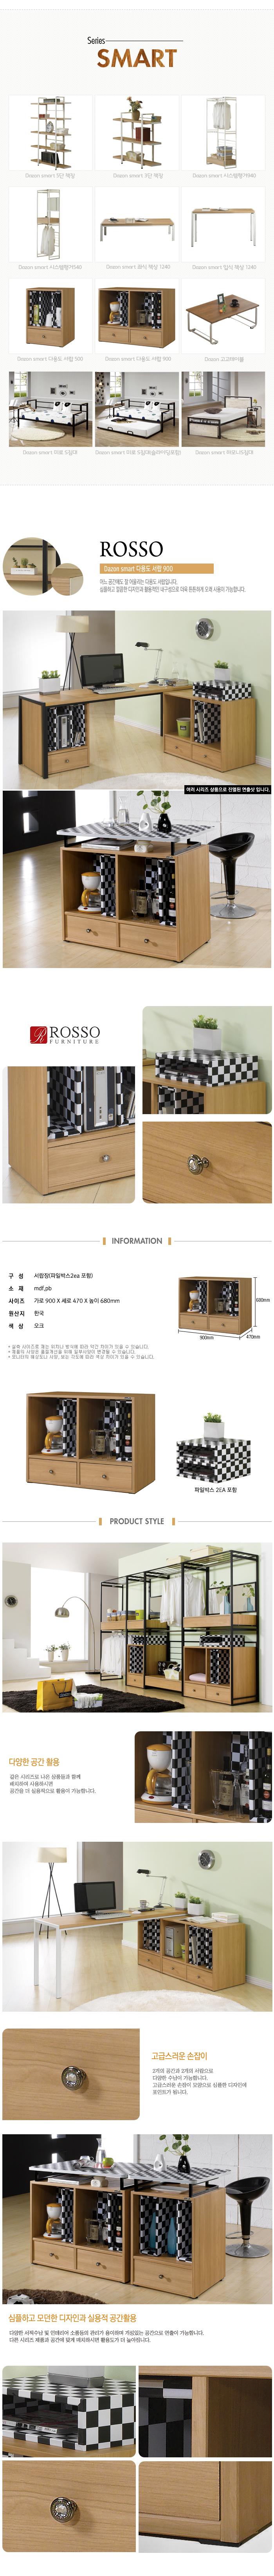 Dazon smart 다용도 서랍 900 - 로쏘, 178,430원, 수납/선반장, 수납장